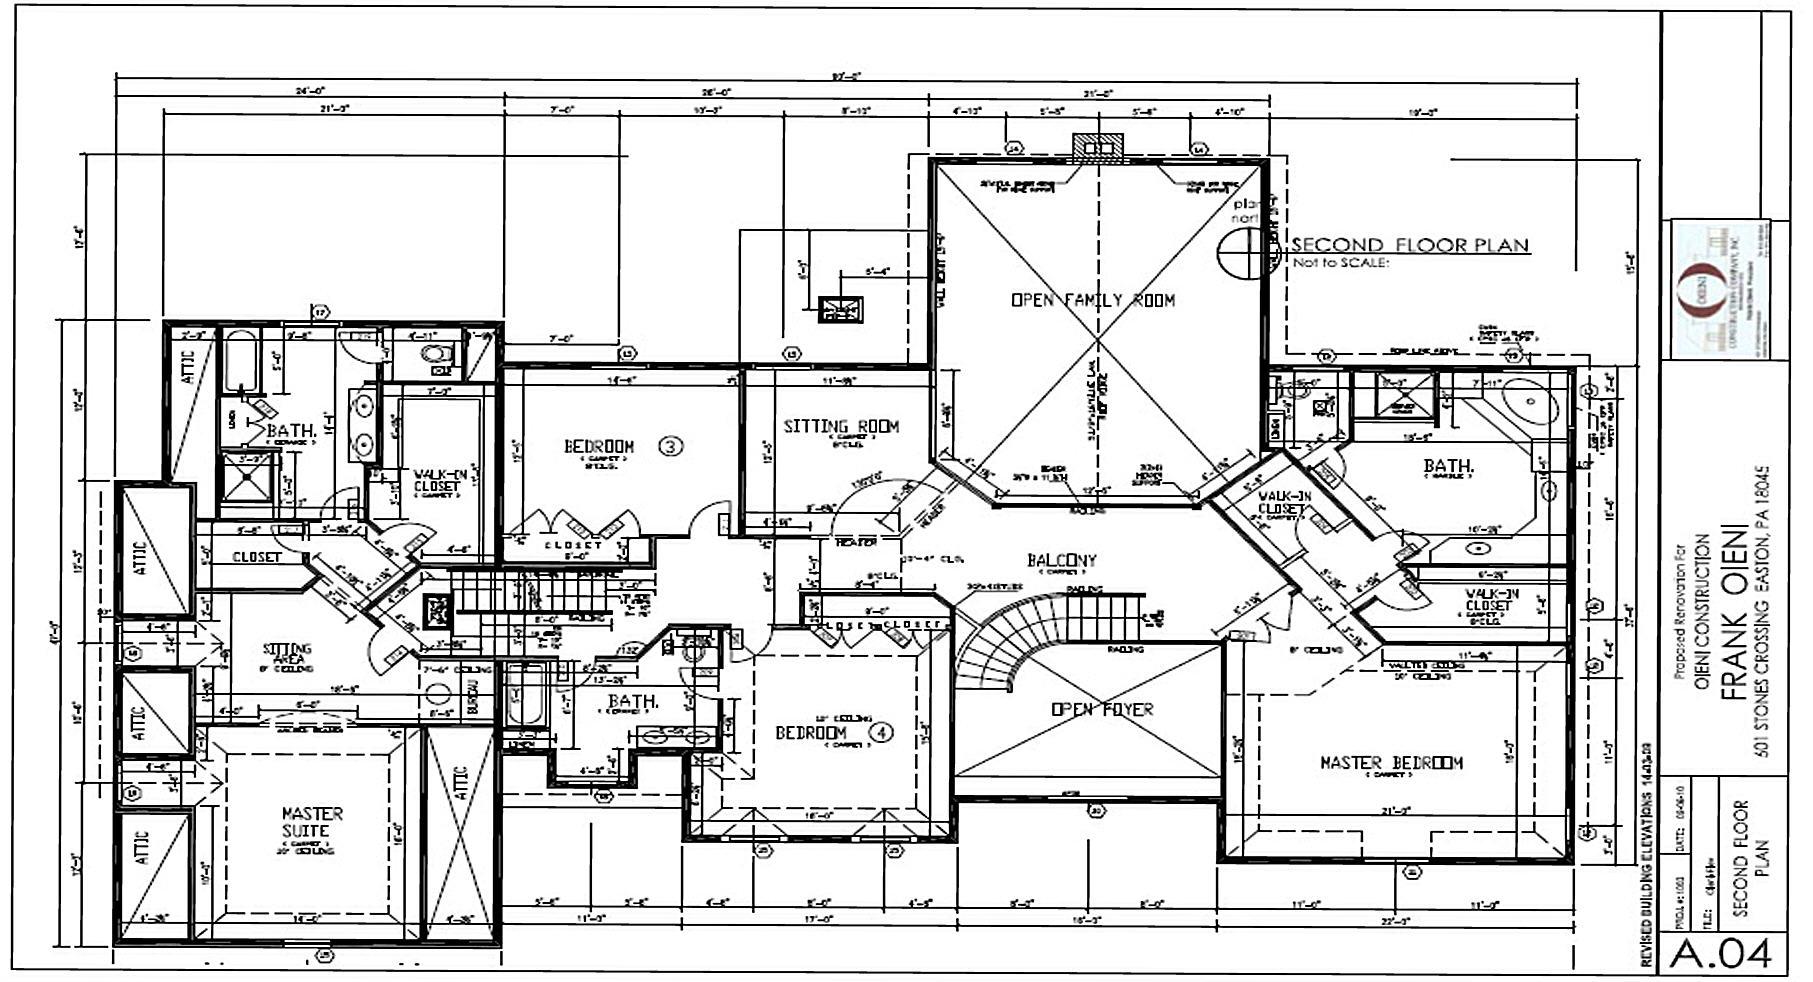 Oieni Construction - BRODHEAD FLOOR PLANS.